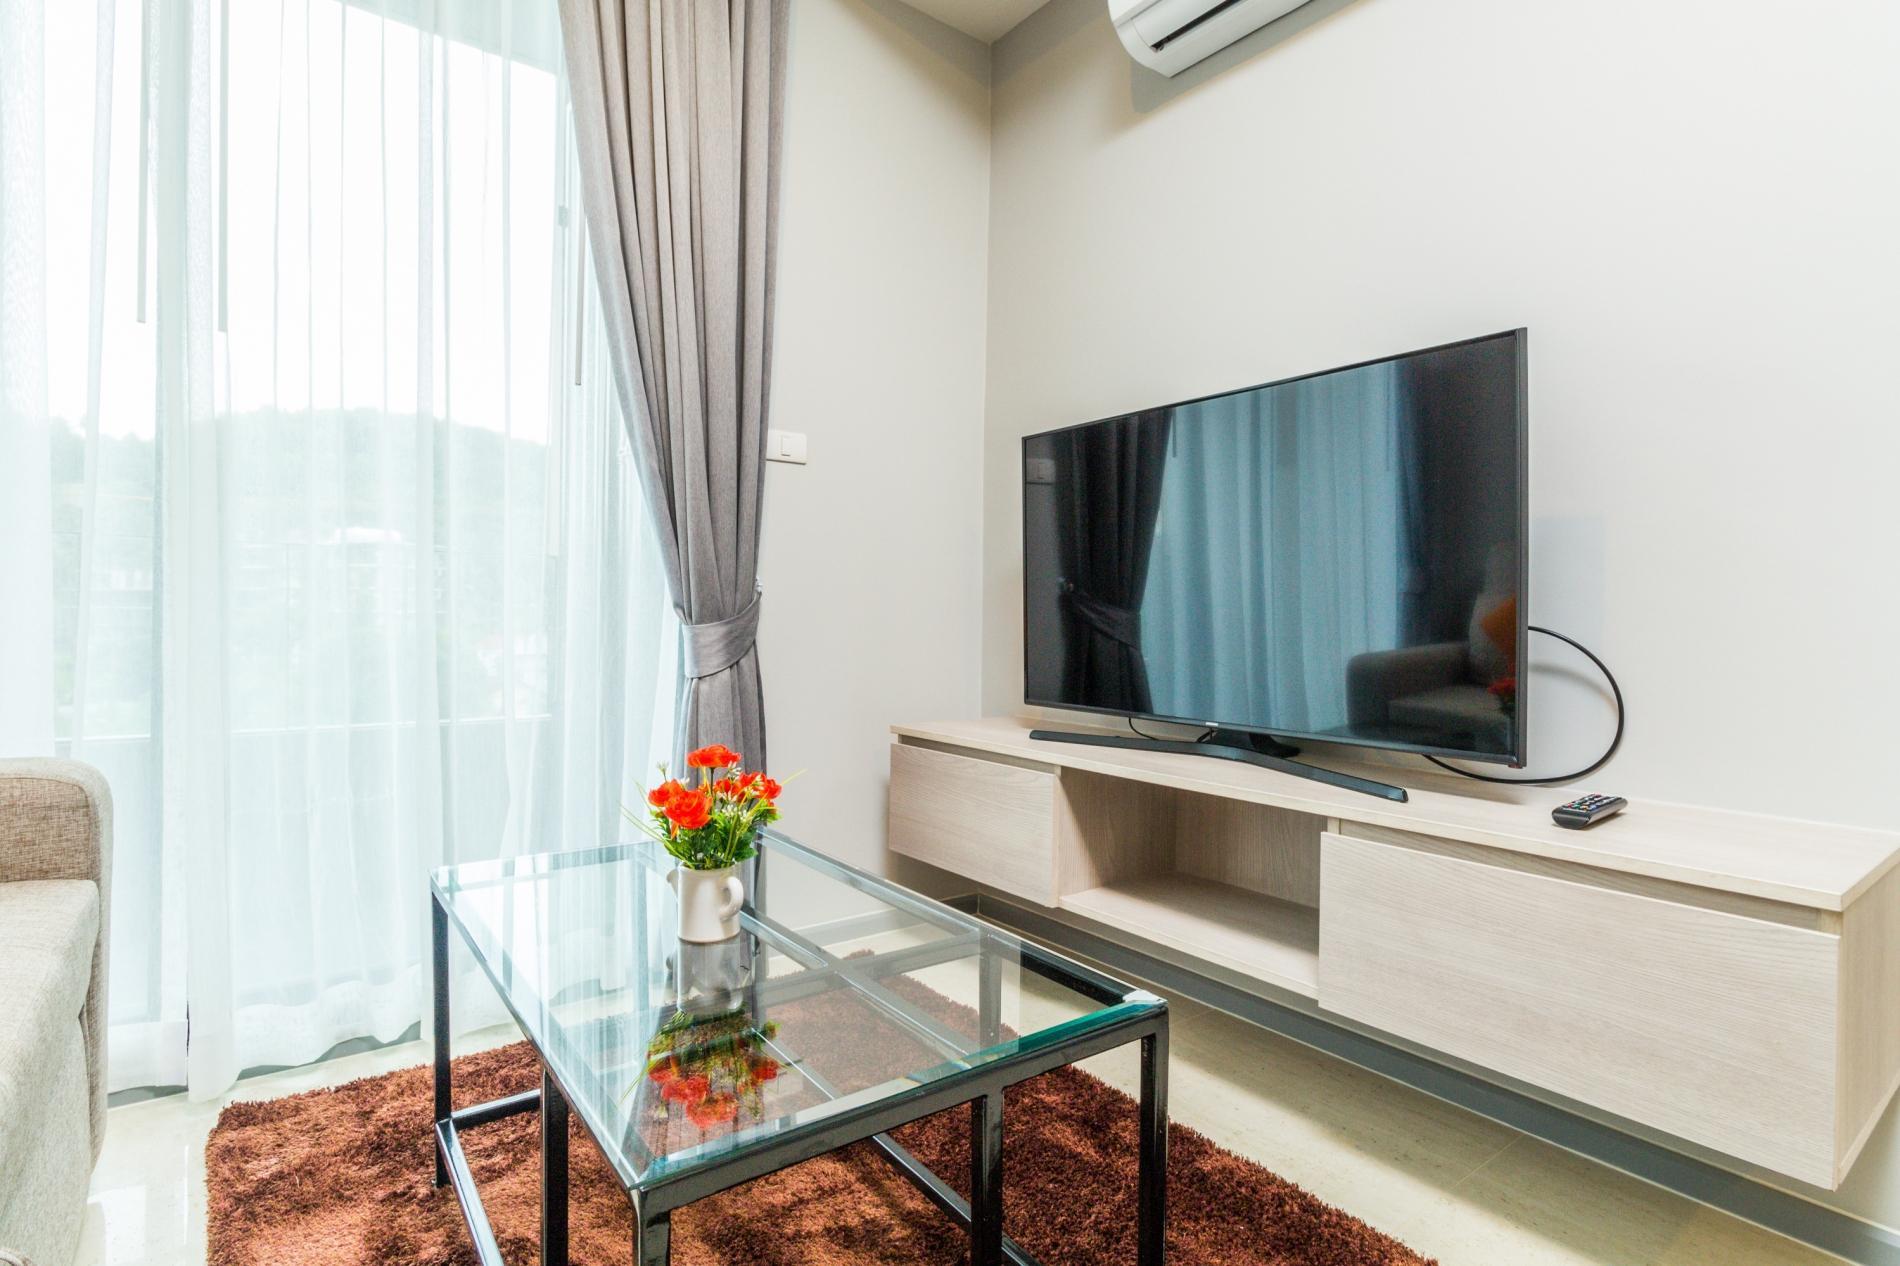 Apartment 6Av 707 - Convenient Surin beach condo with pool and gym photo 18268428